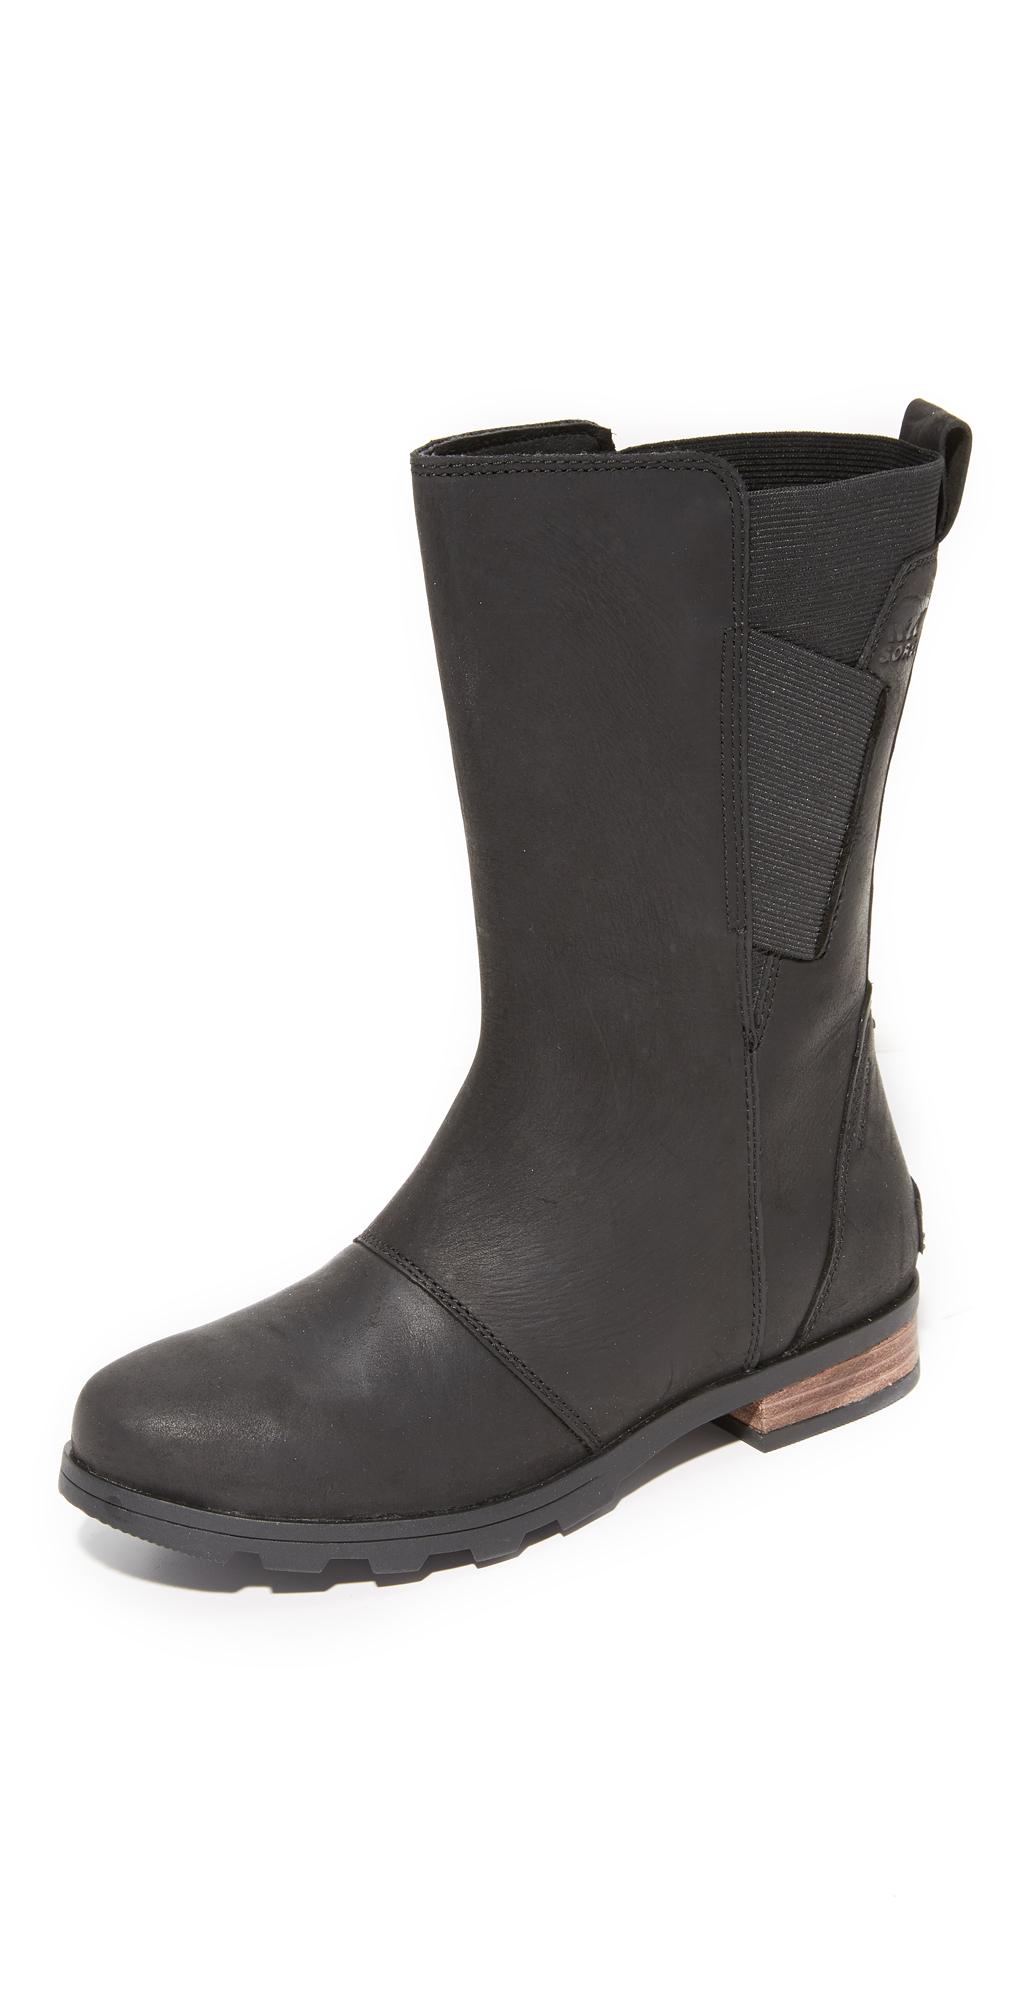 Emelie Mid Boots Sorel